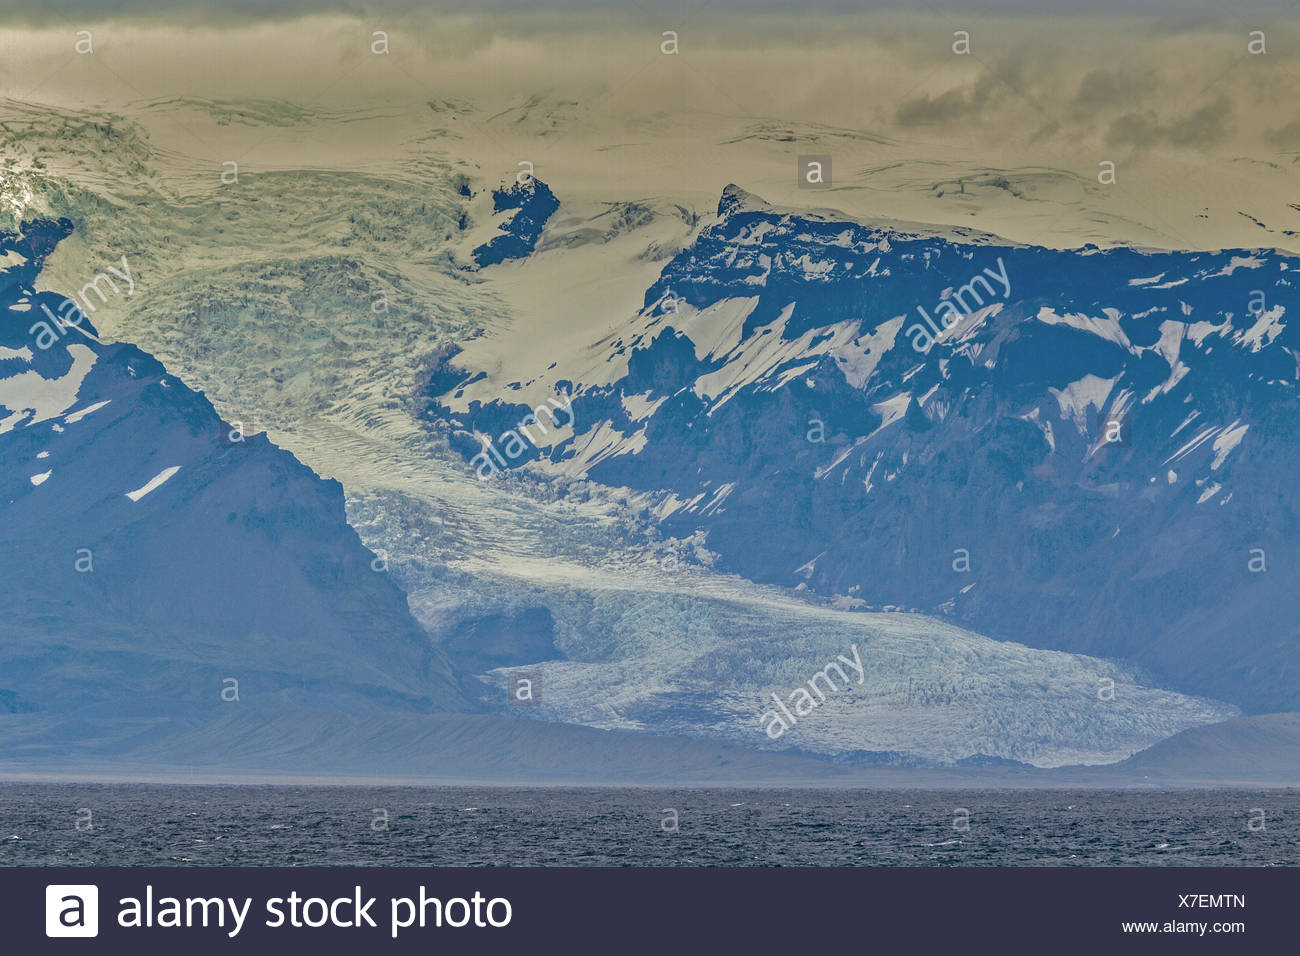 Glacier Reaching The Sea Iceland - Stock Image